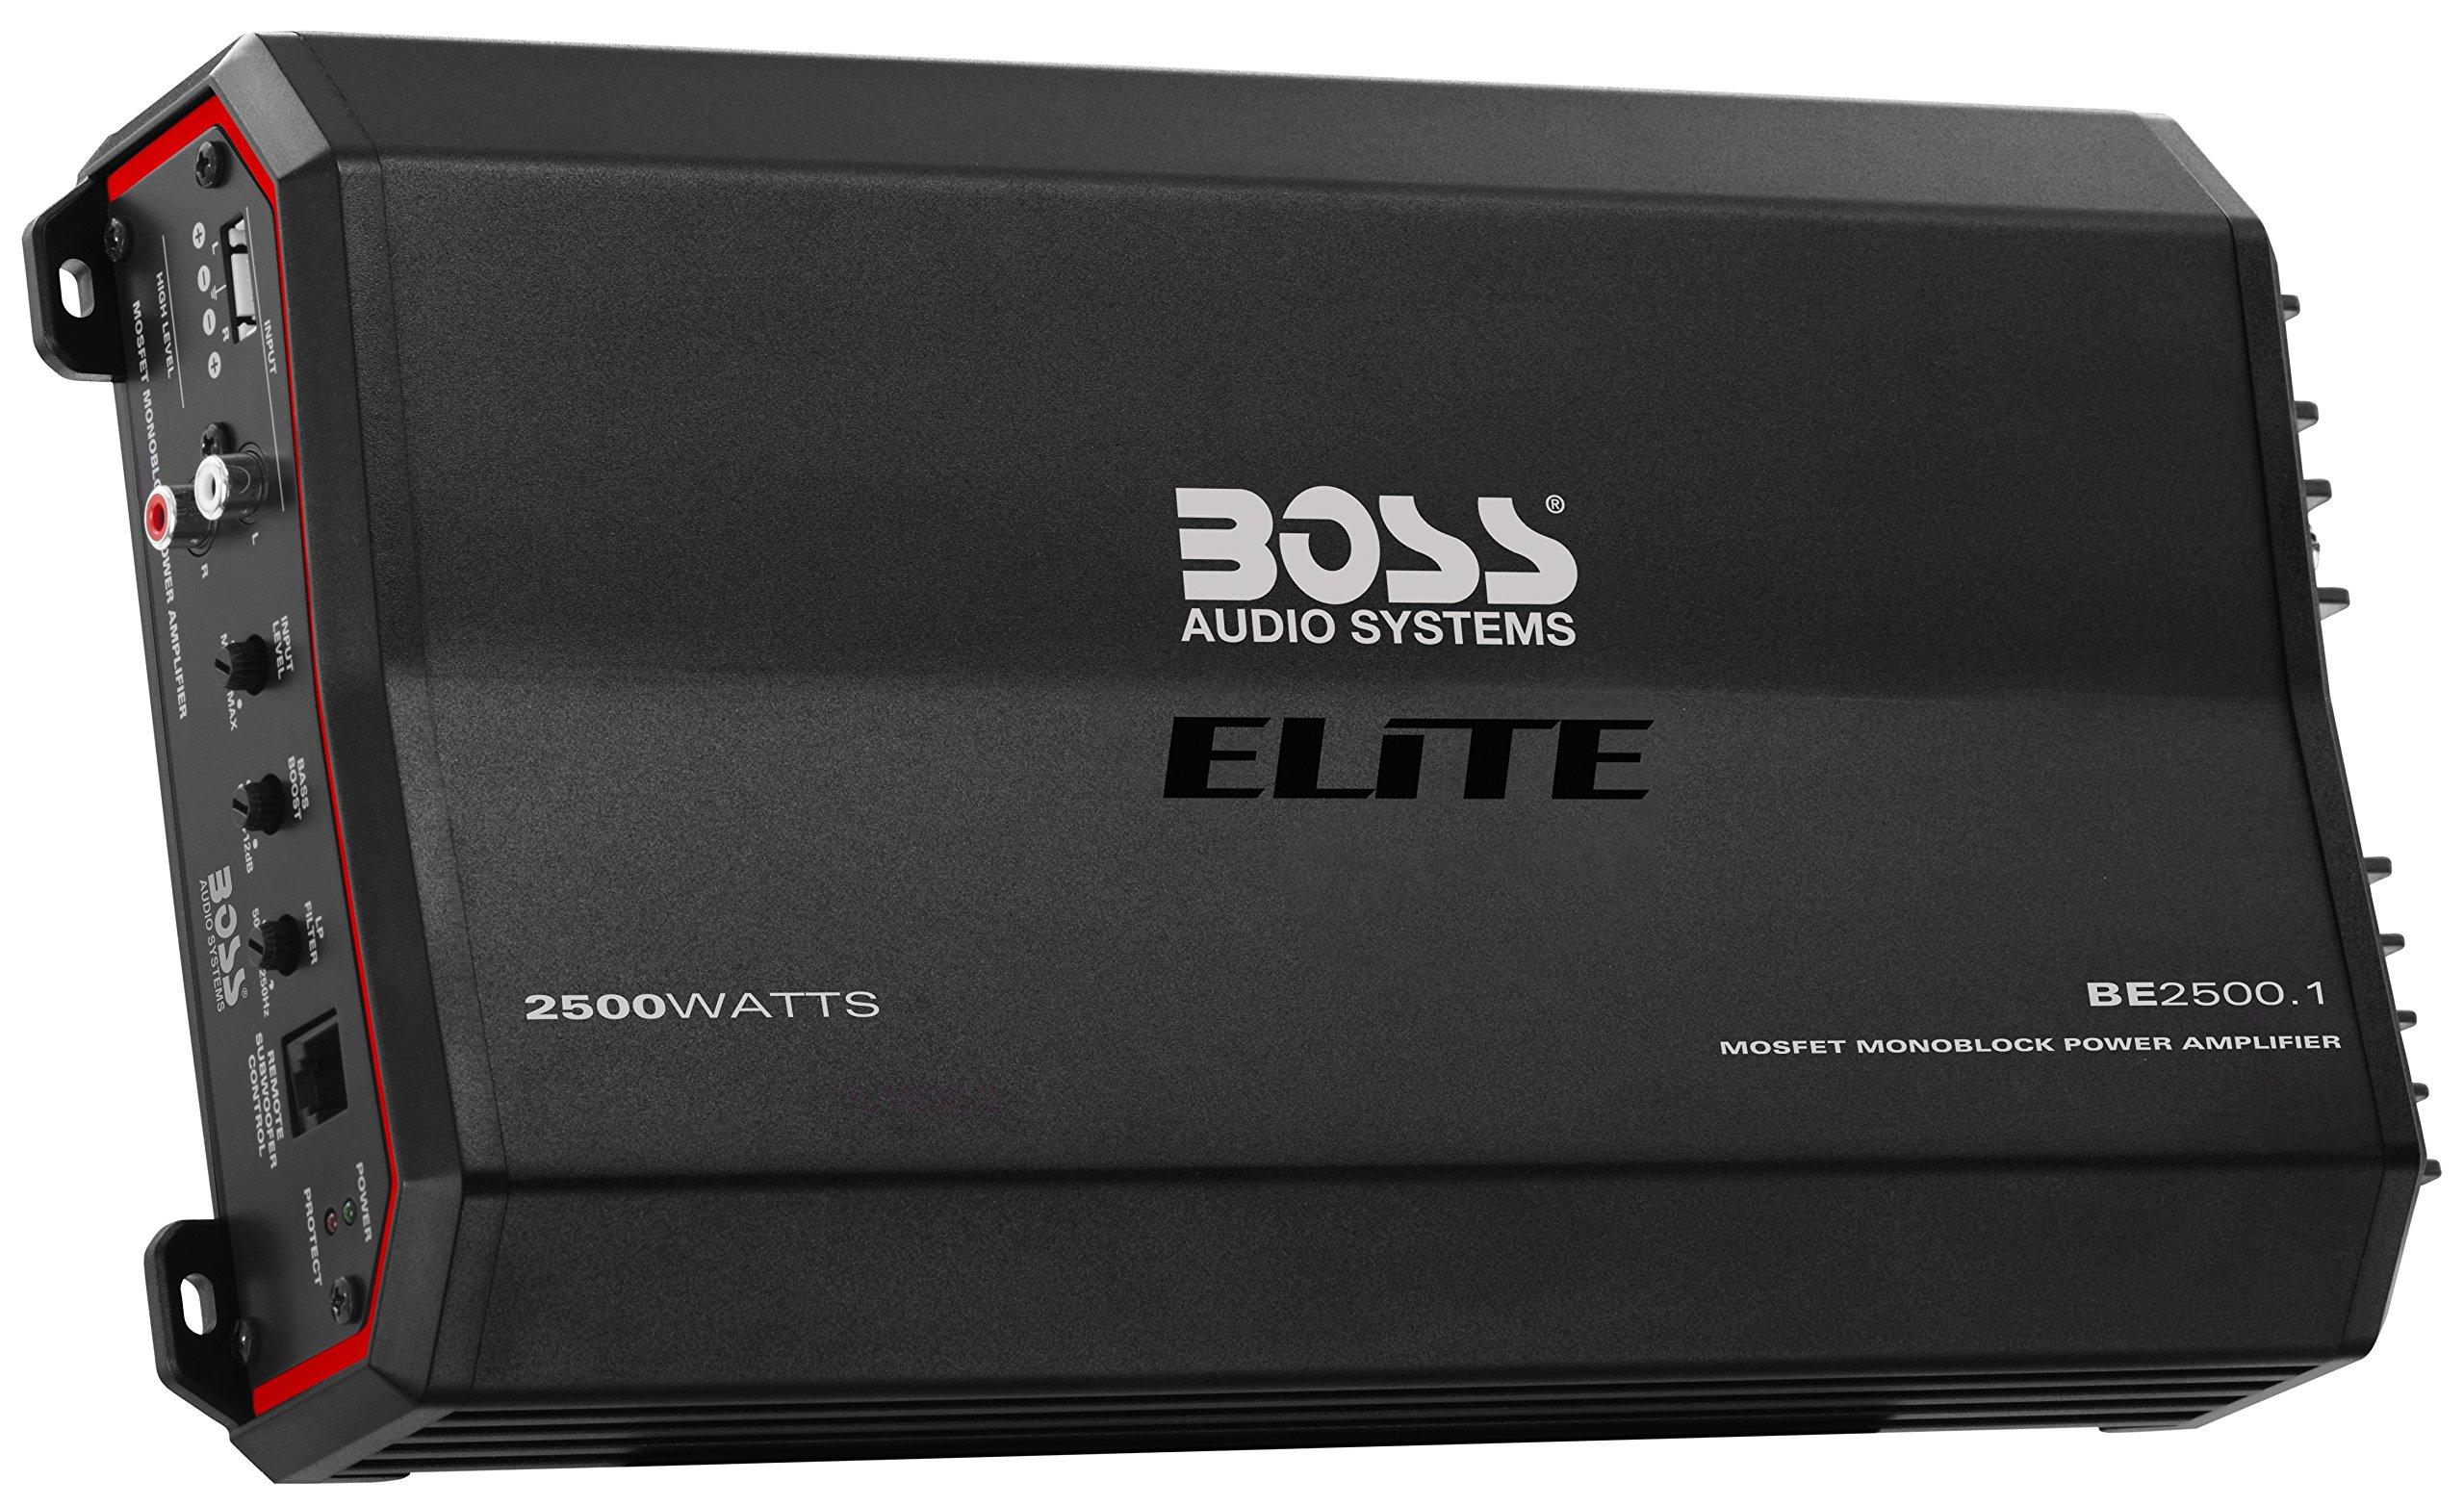 BOSS Audio Elite Series Car Amplifier, Model BE2500.1 | 2500 Watt Monoblock with Mosfet Power Supply